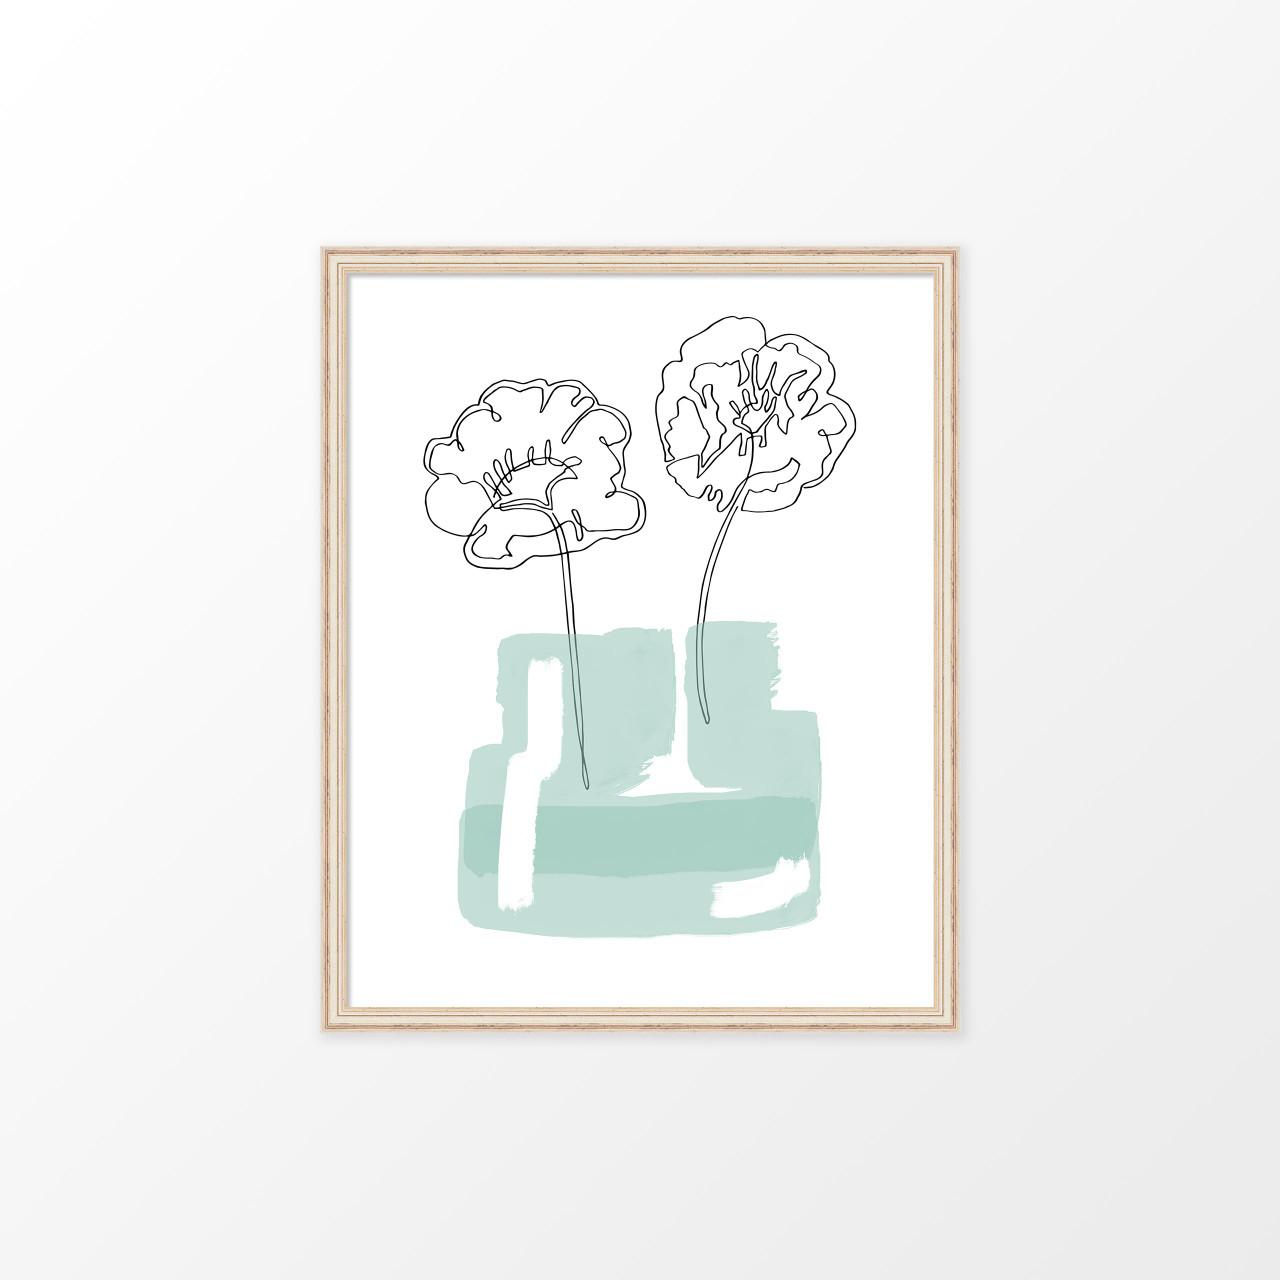 'Poppy Jar' Original Art Print from The Printed Home (Printable)